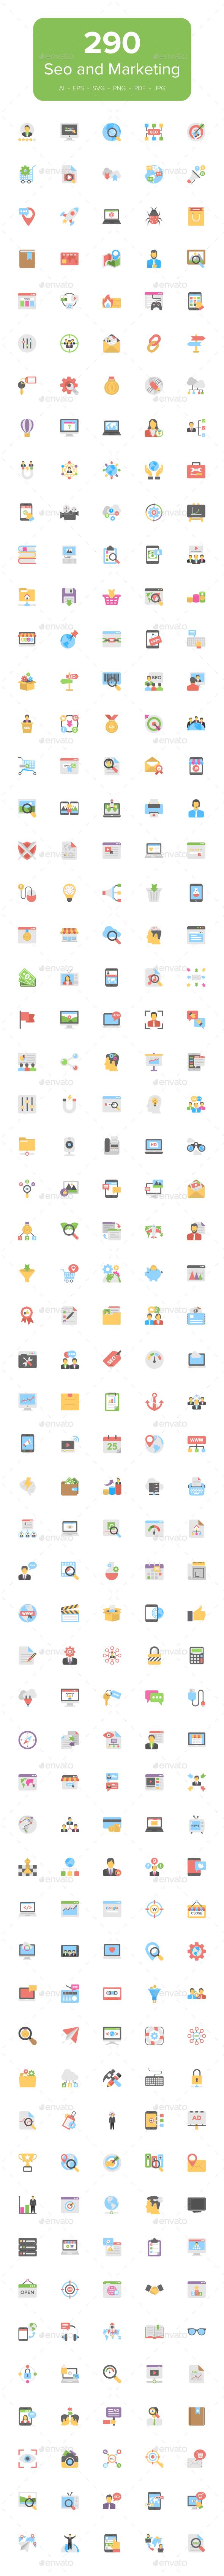 290 Flat Seo and Marketing Icons - Icons